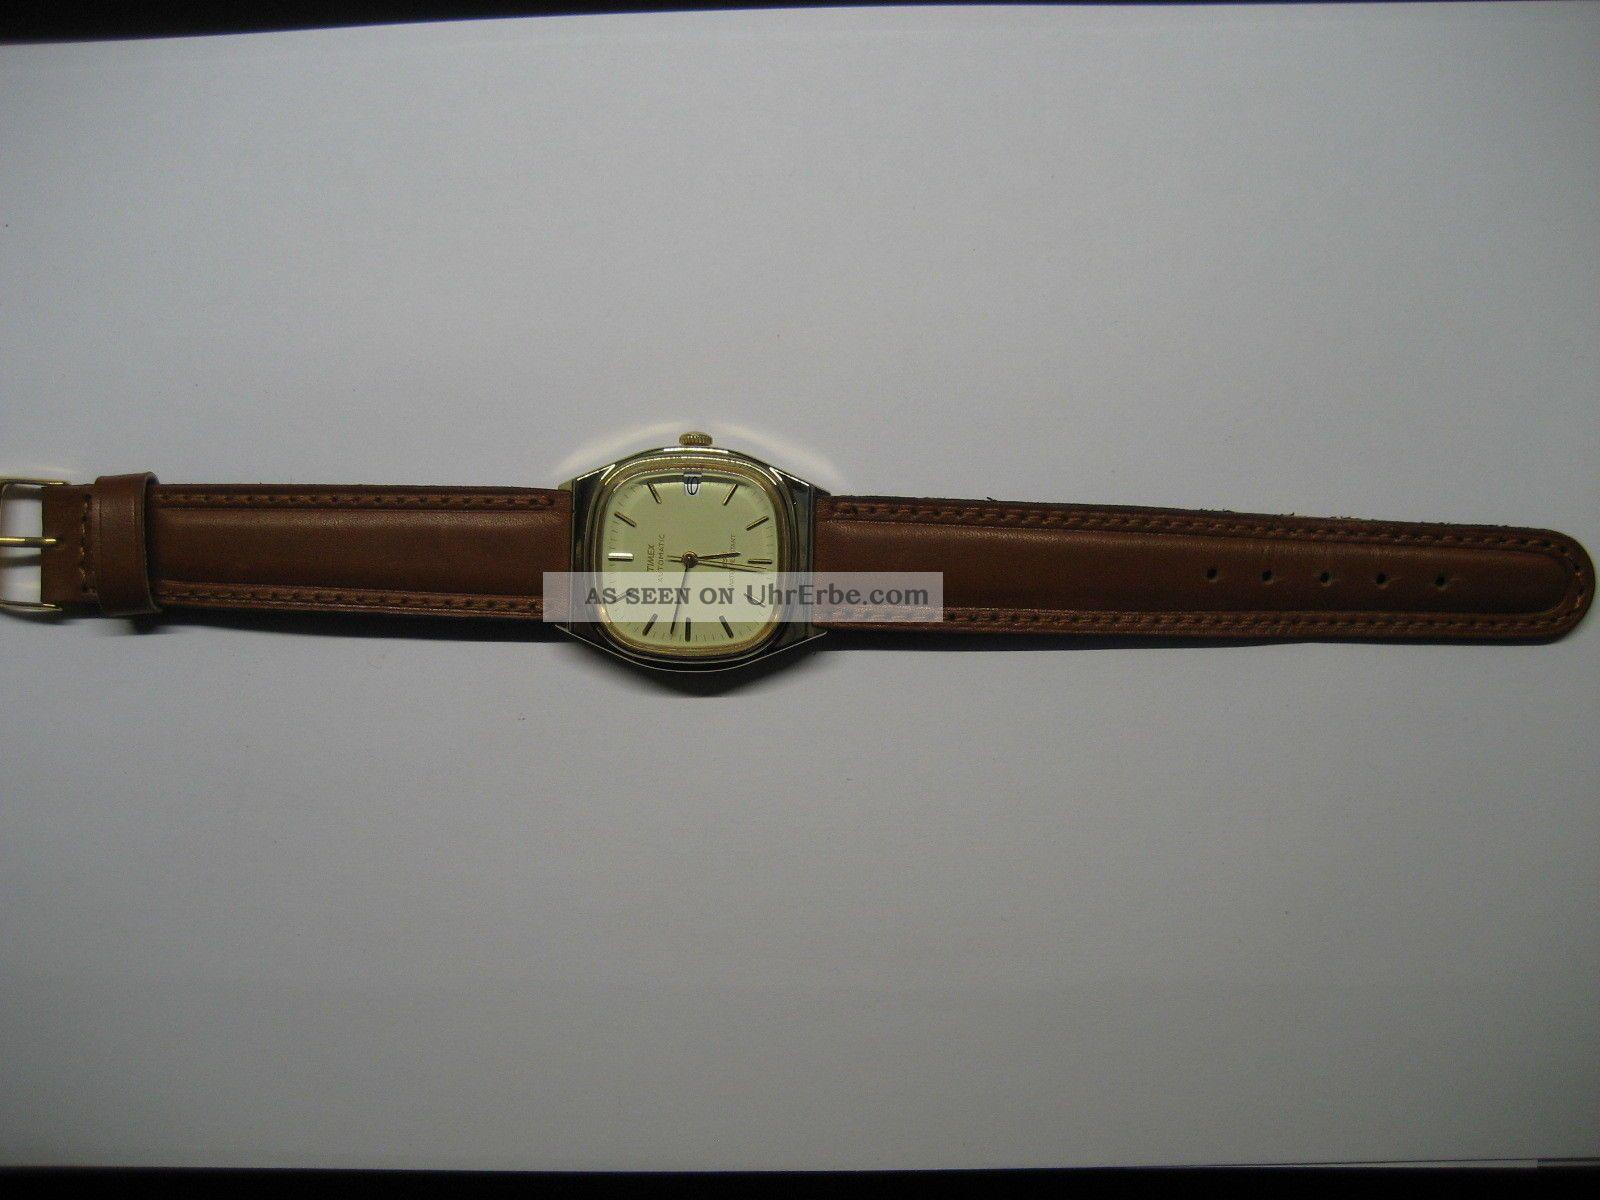 Erhaltene Timex Automatic Herrenarmbanduhr Armbanduhren Bild